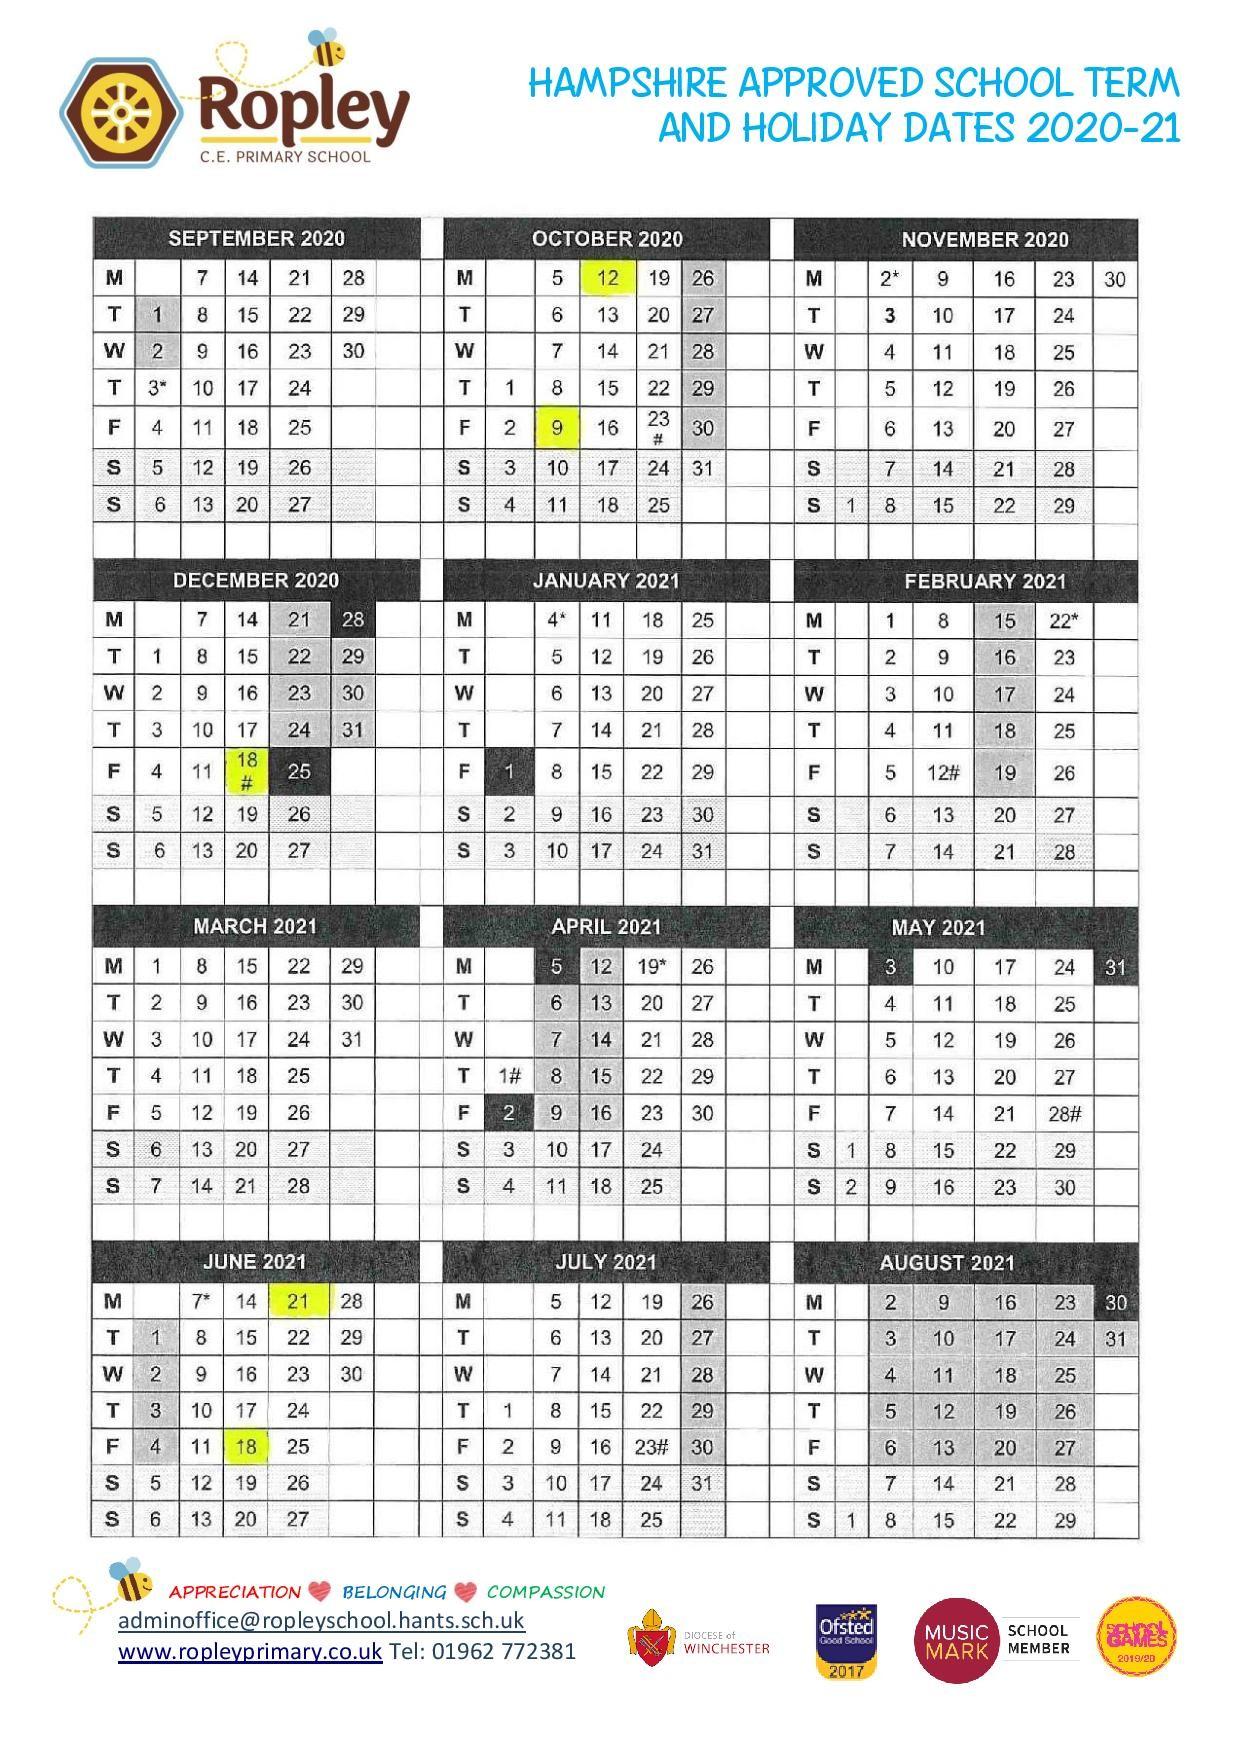 Hampshire School Holiday Dates  Ropley C.e. Primary School with regard to Matravers School Calendar